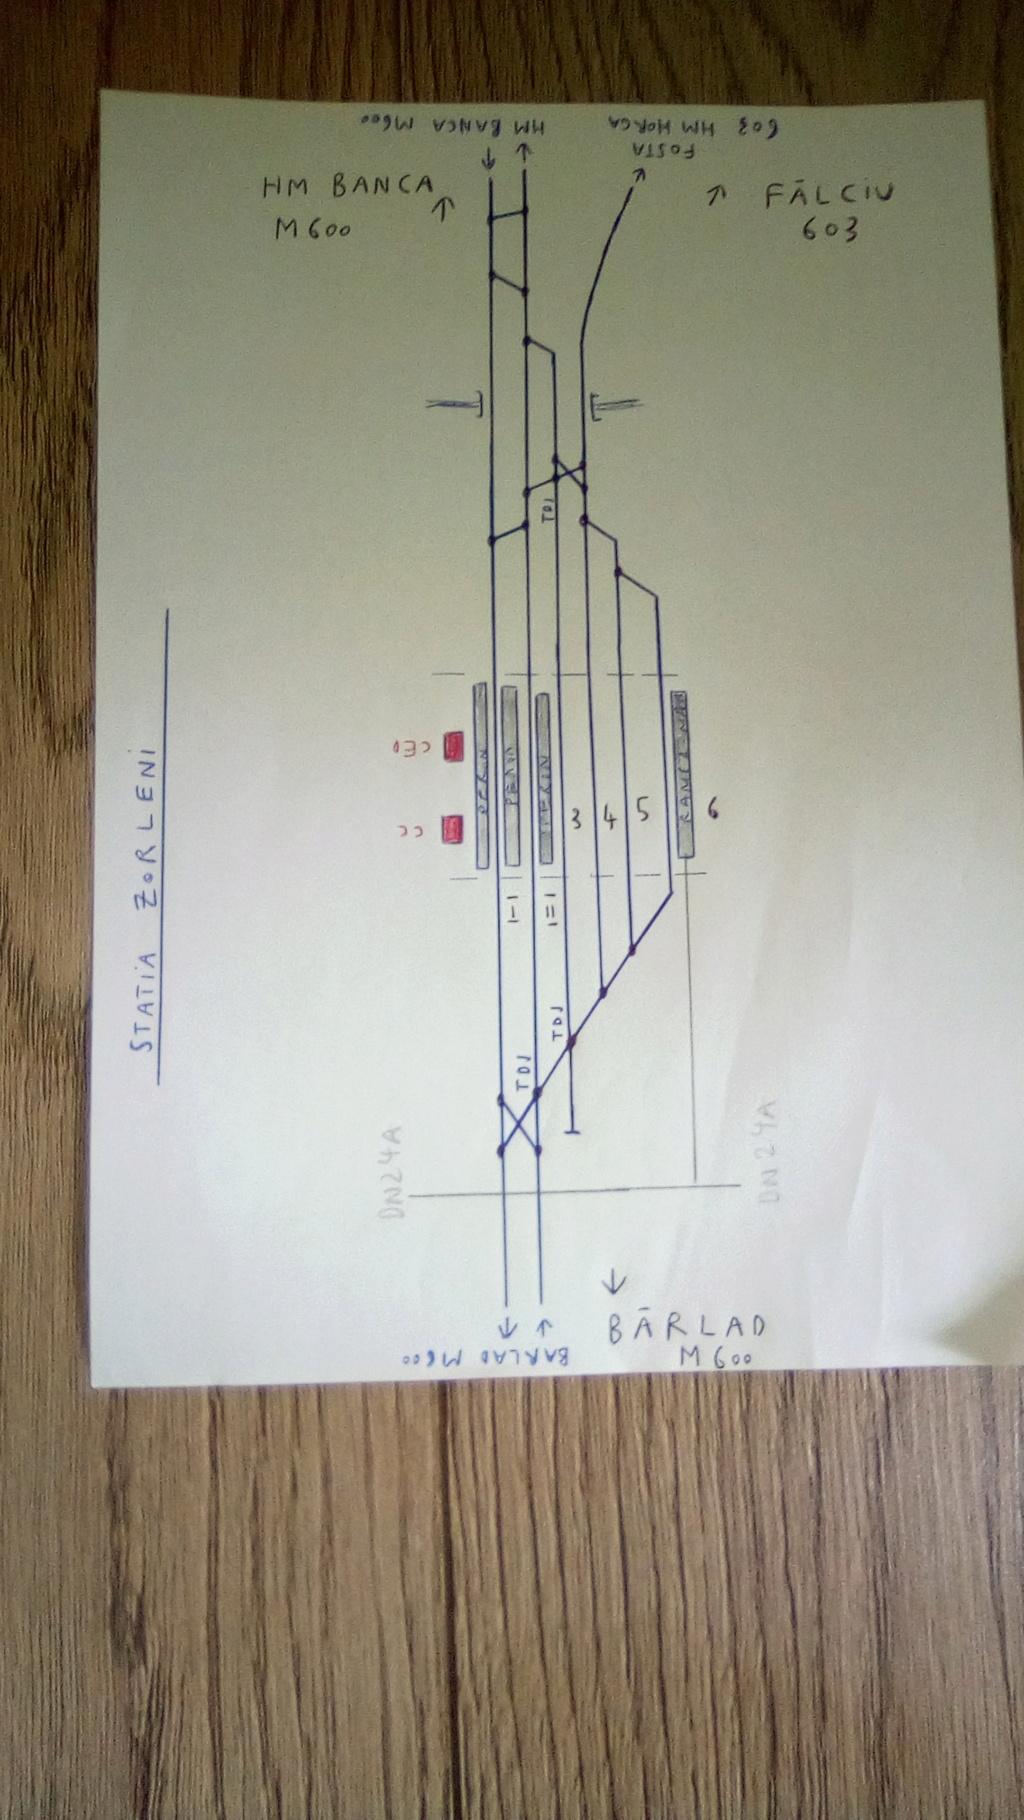 M 600 : Faurei - Tecuci - Vaslui - Iasi - Ungheni   - Pagina 21 Hm_zor10